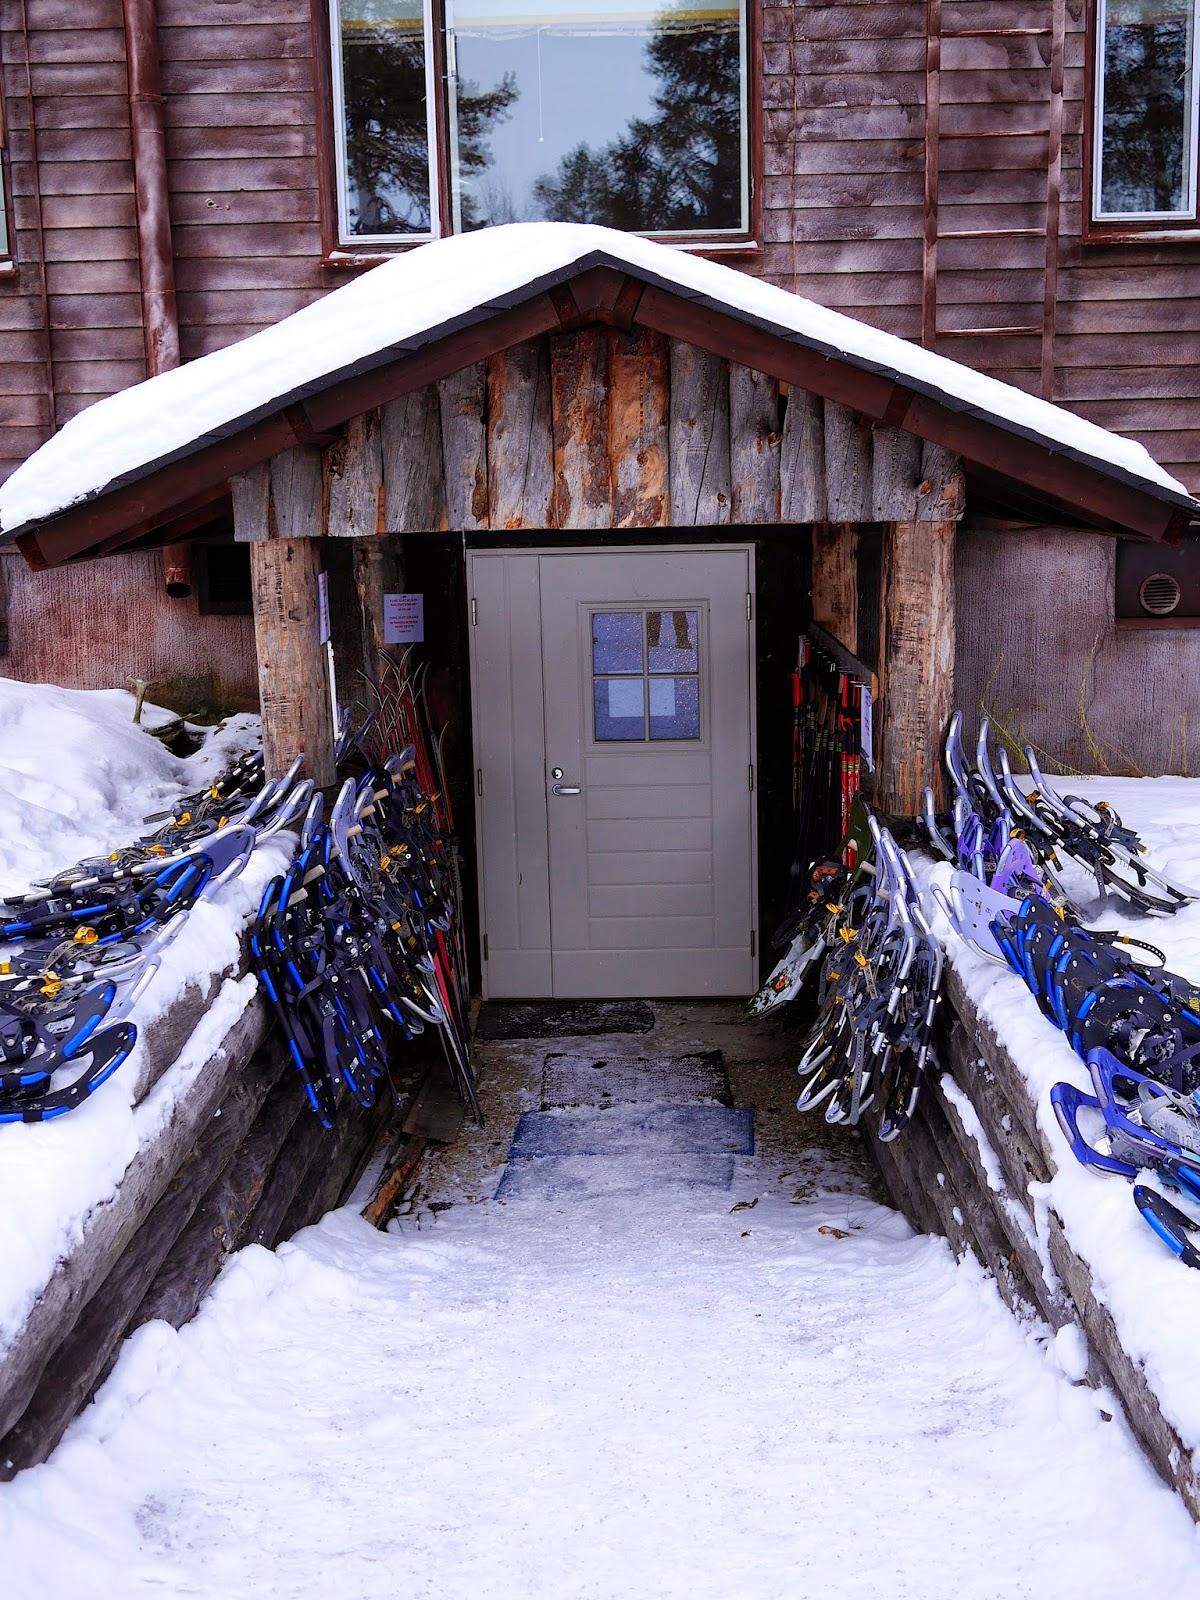 Snowshoes at Hotel Korpikartano, Finland